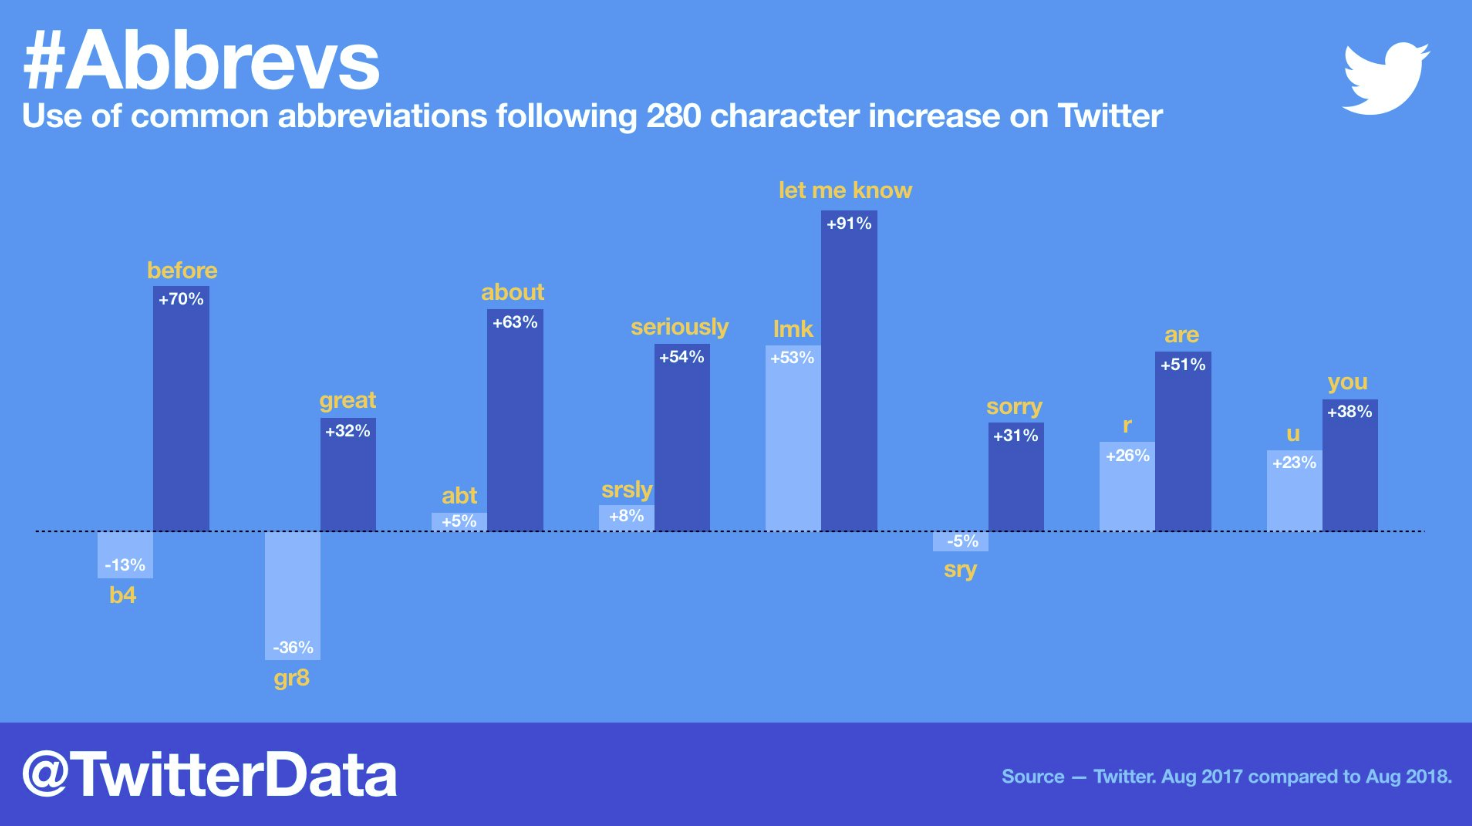 Twitter abbreviations data